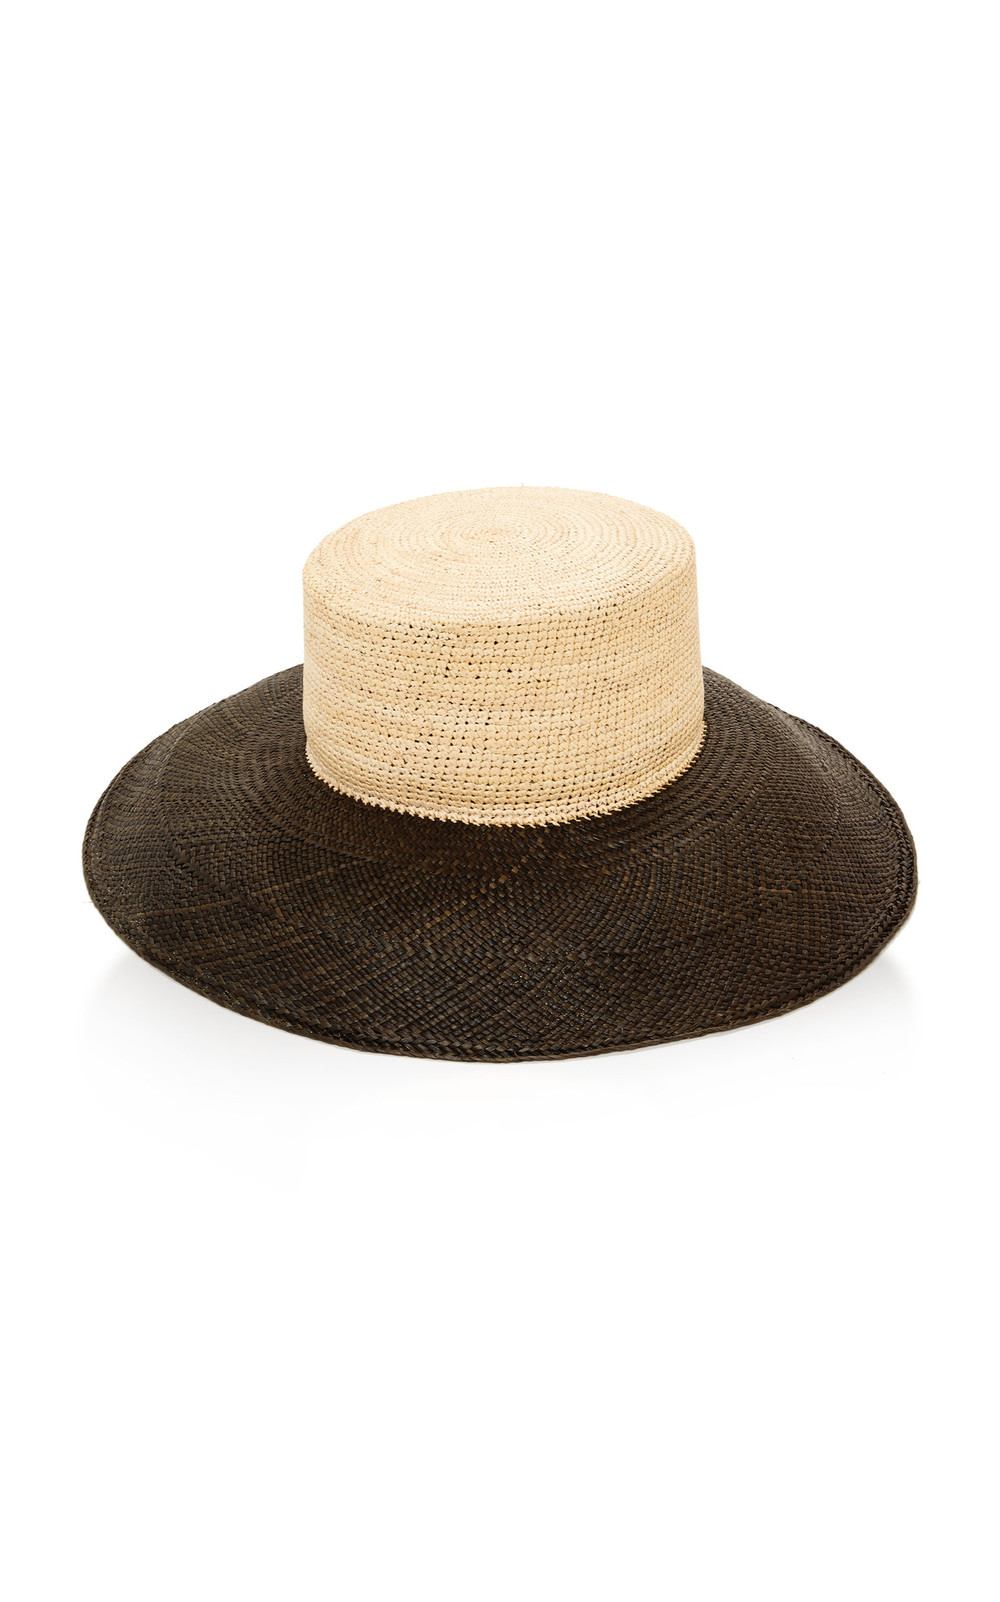 Janessa Leone Noemie Two-Tone Straw Hat in neutral